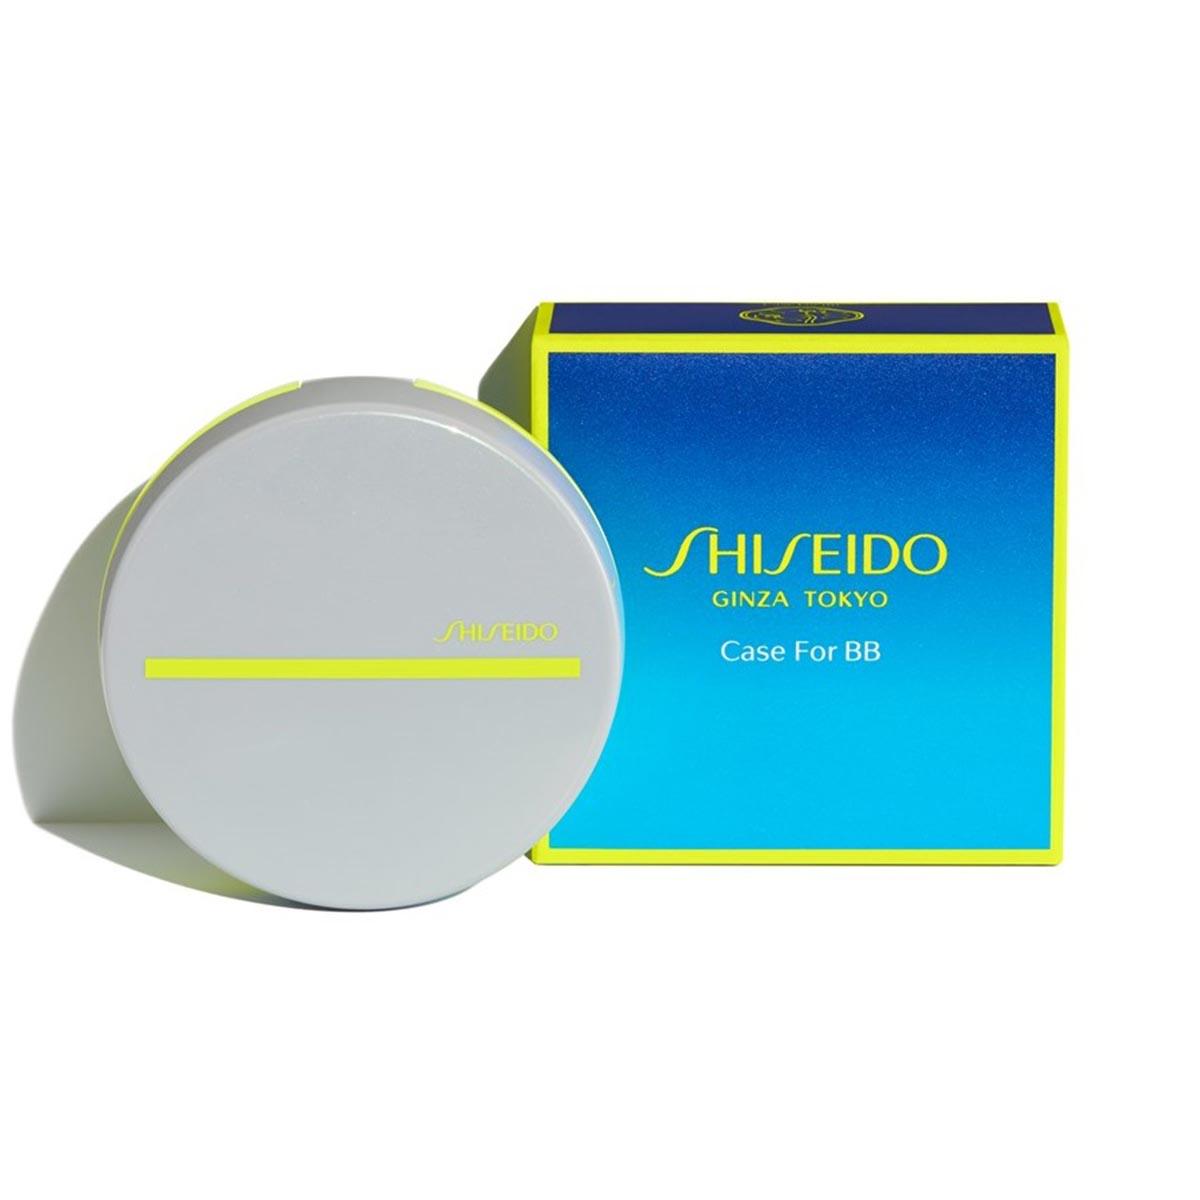 Shiseido case for bb medium dark